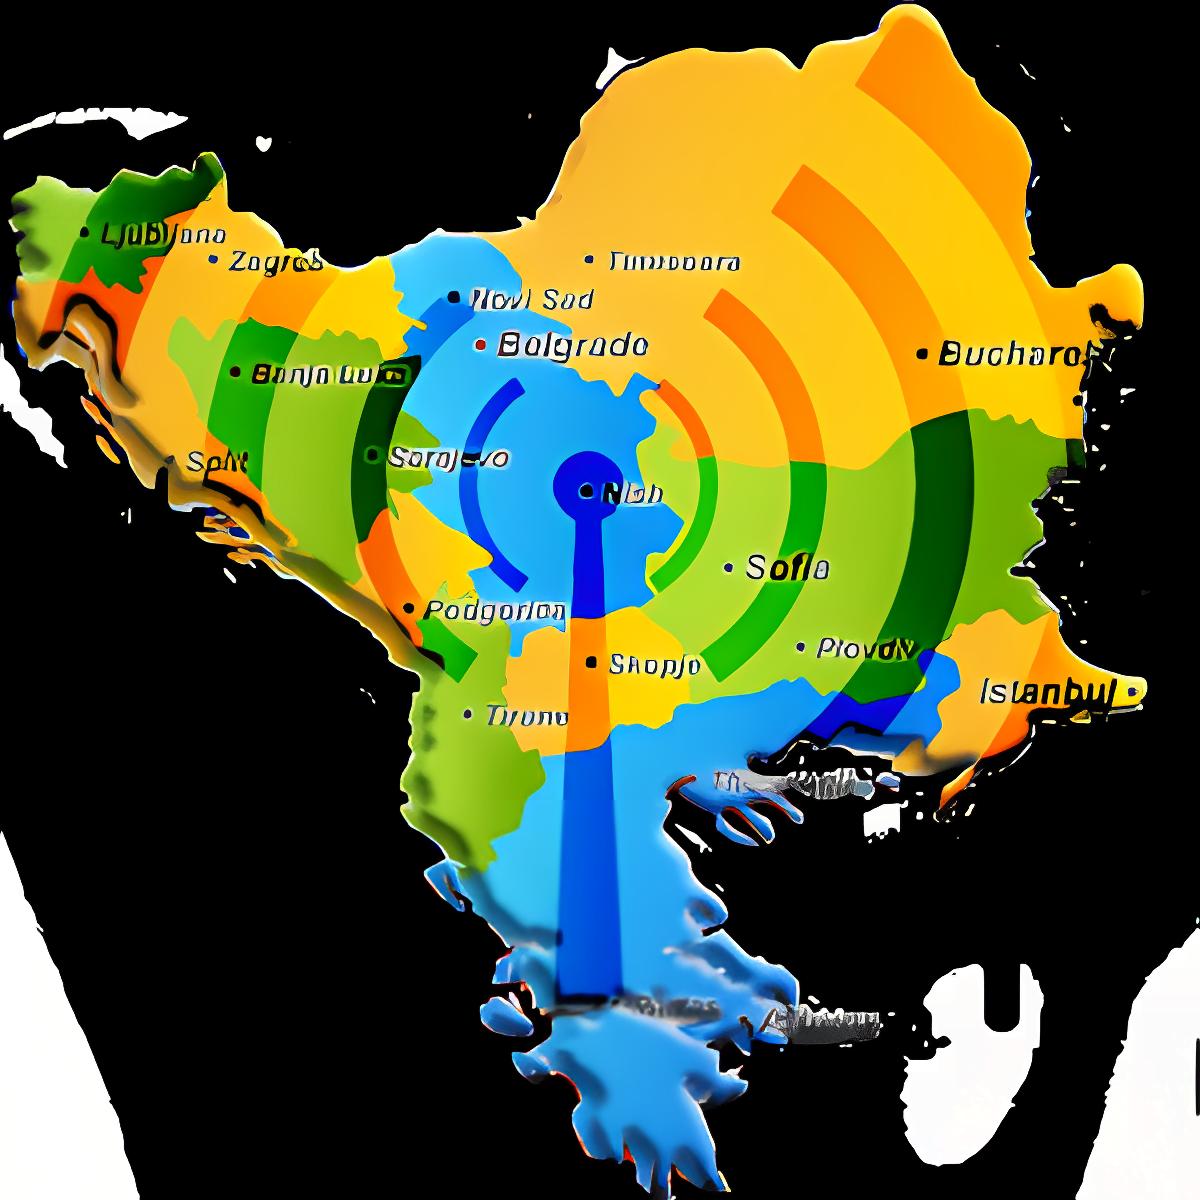 Balcanes Emisoras de Radio Voz 1.3